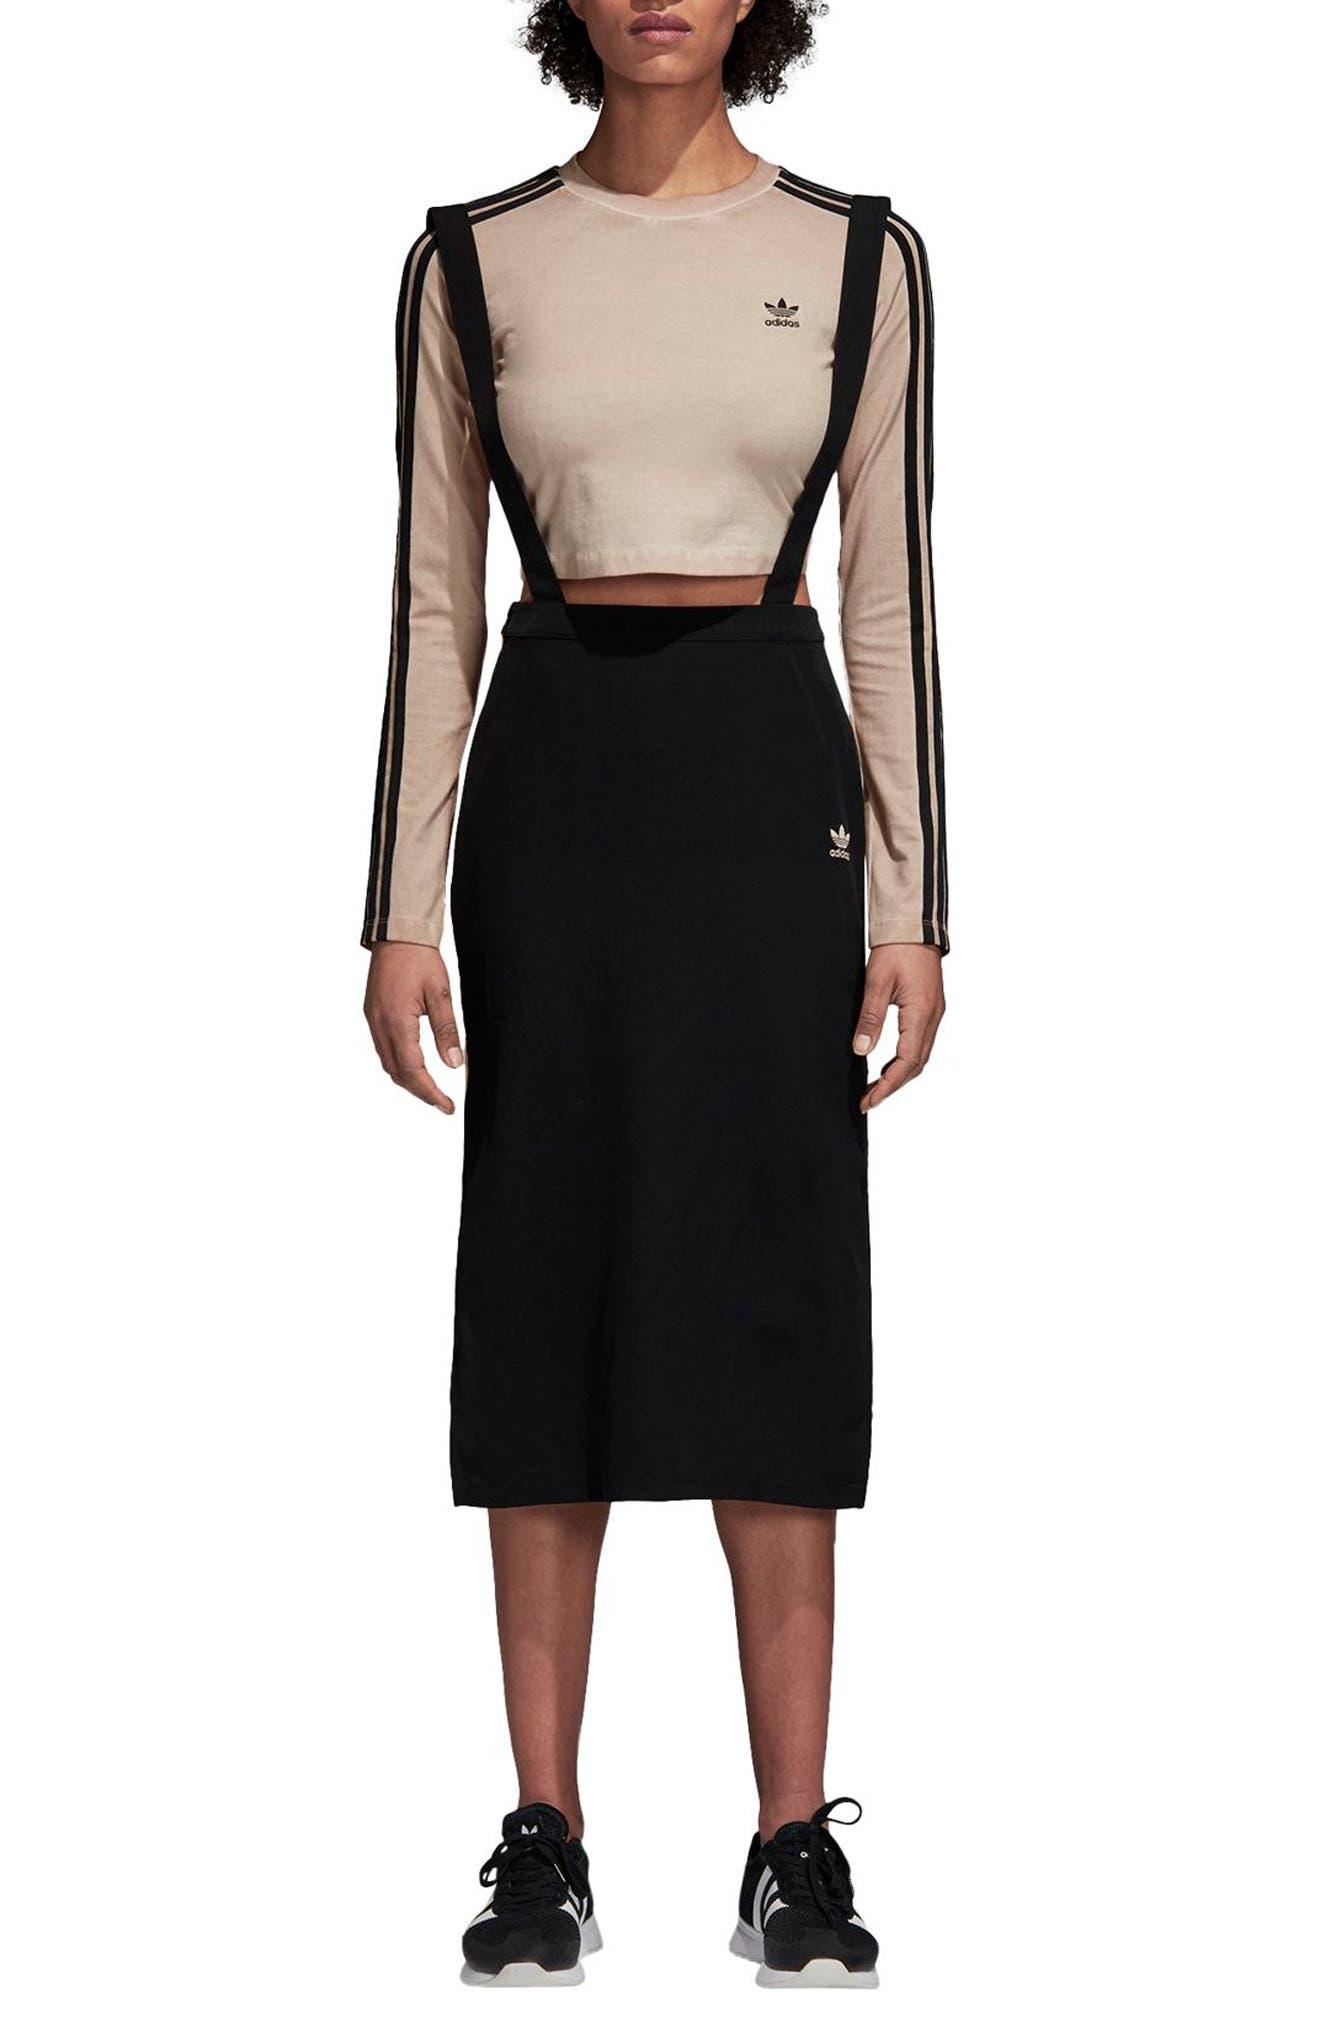 ADIDAS ORIGINALS,                             Midi Skirt with Shoulder Straps,                             Main thumbnail 1, color,                             001